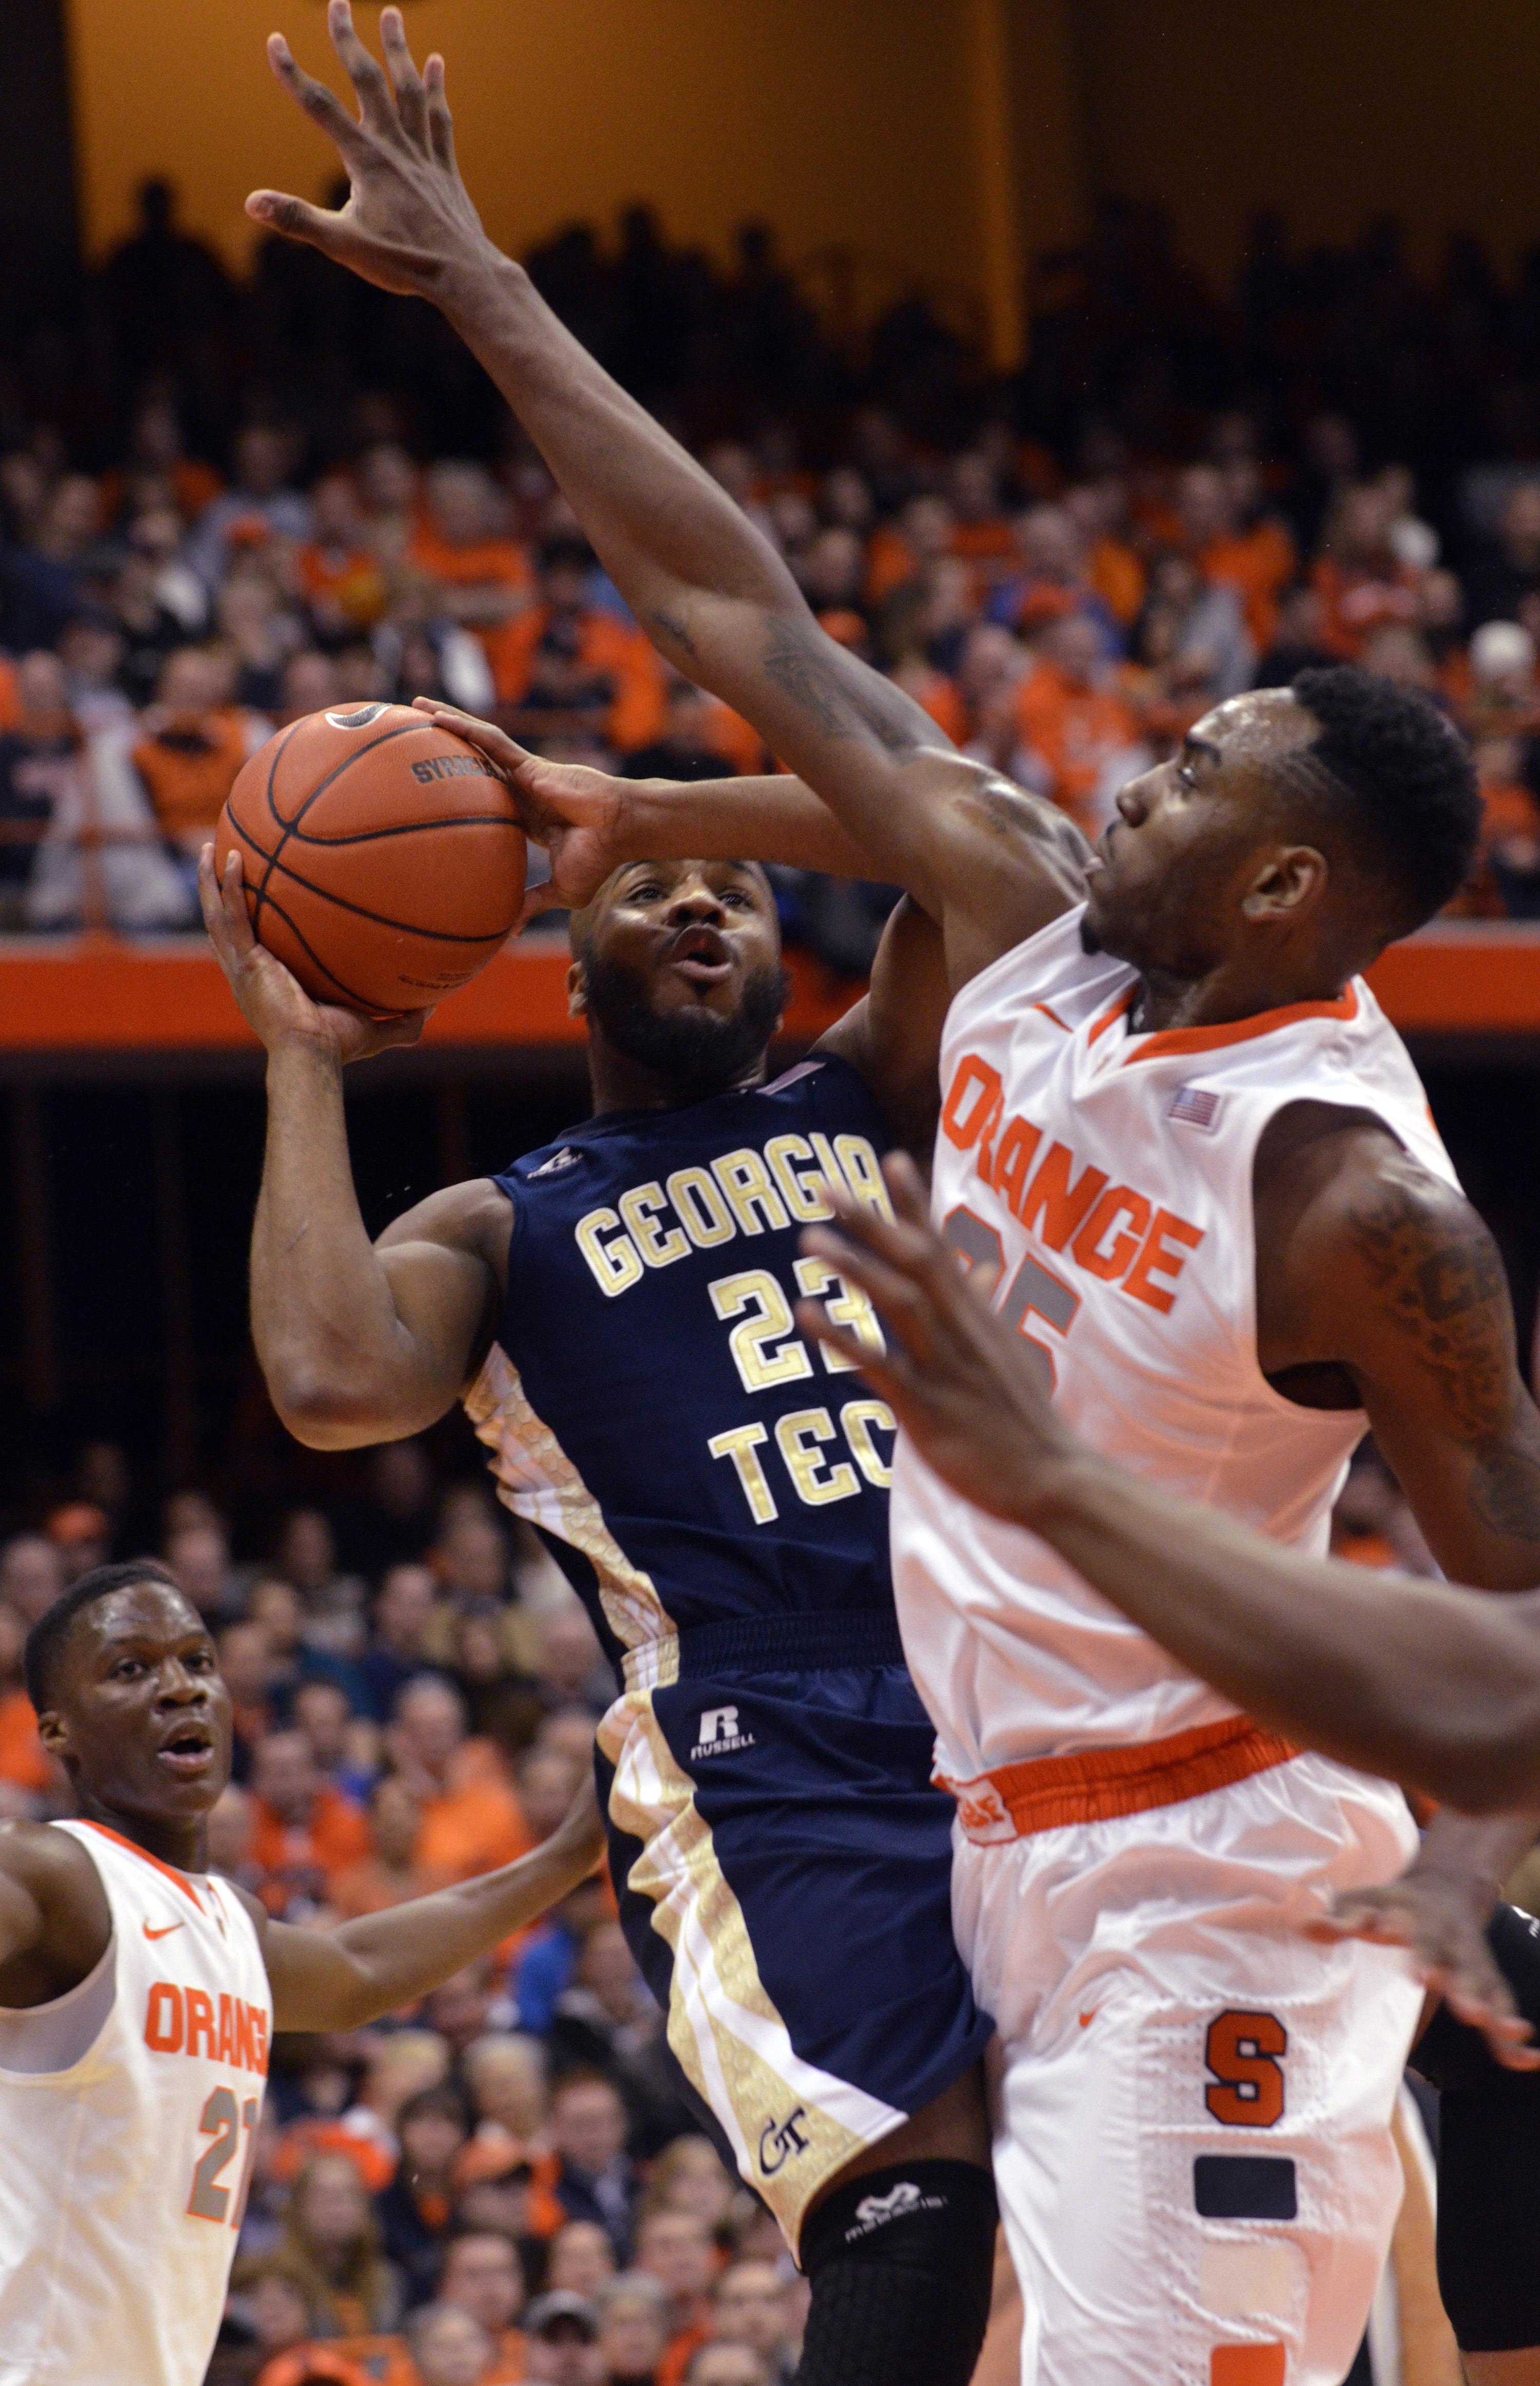 Georgia Tech's Trae Golden drives against Syracuse's Rakeem Christmas in the first half.